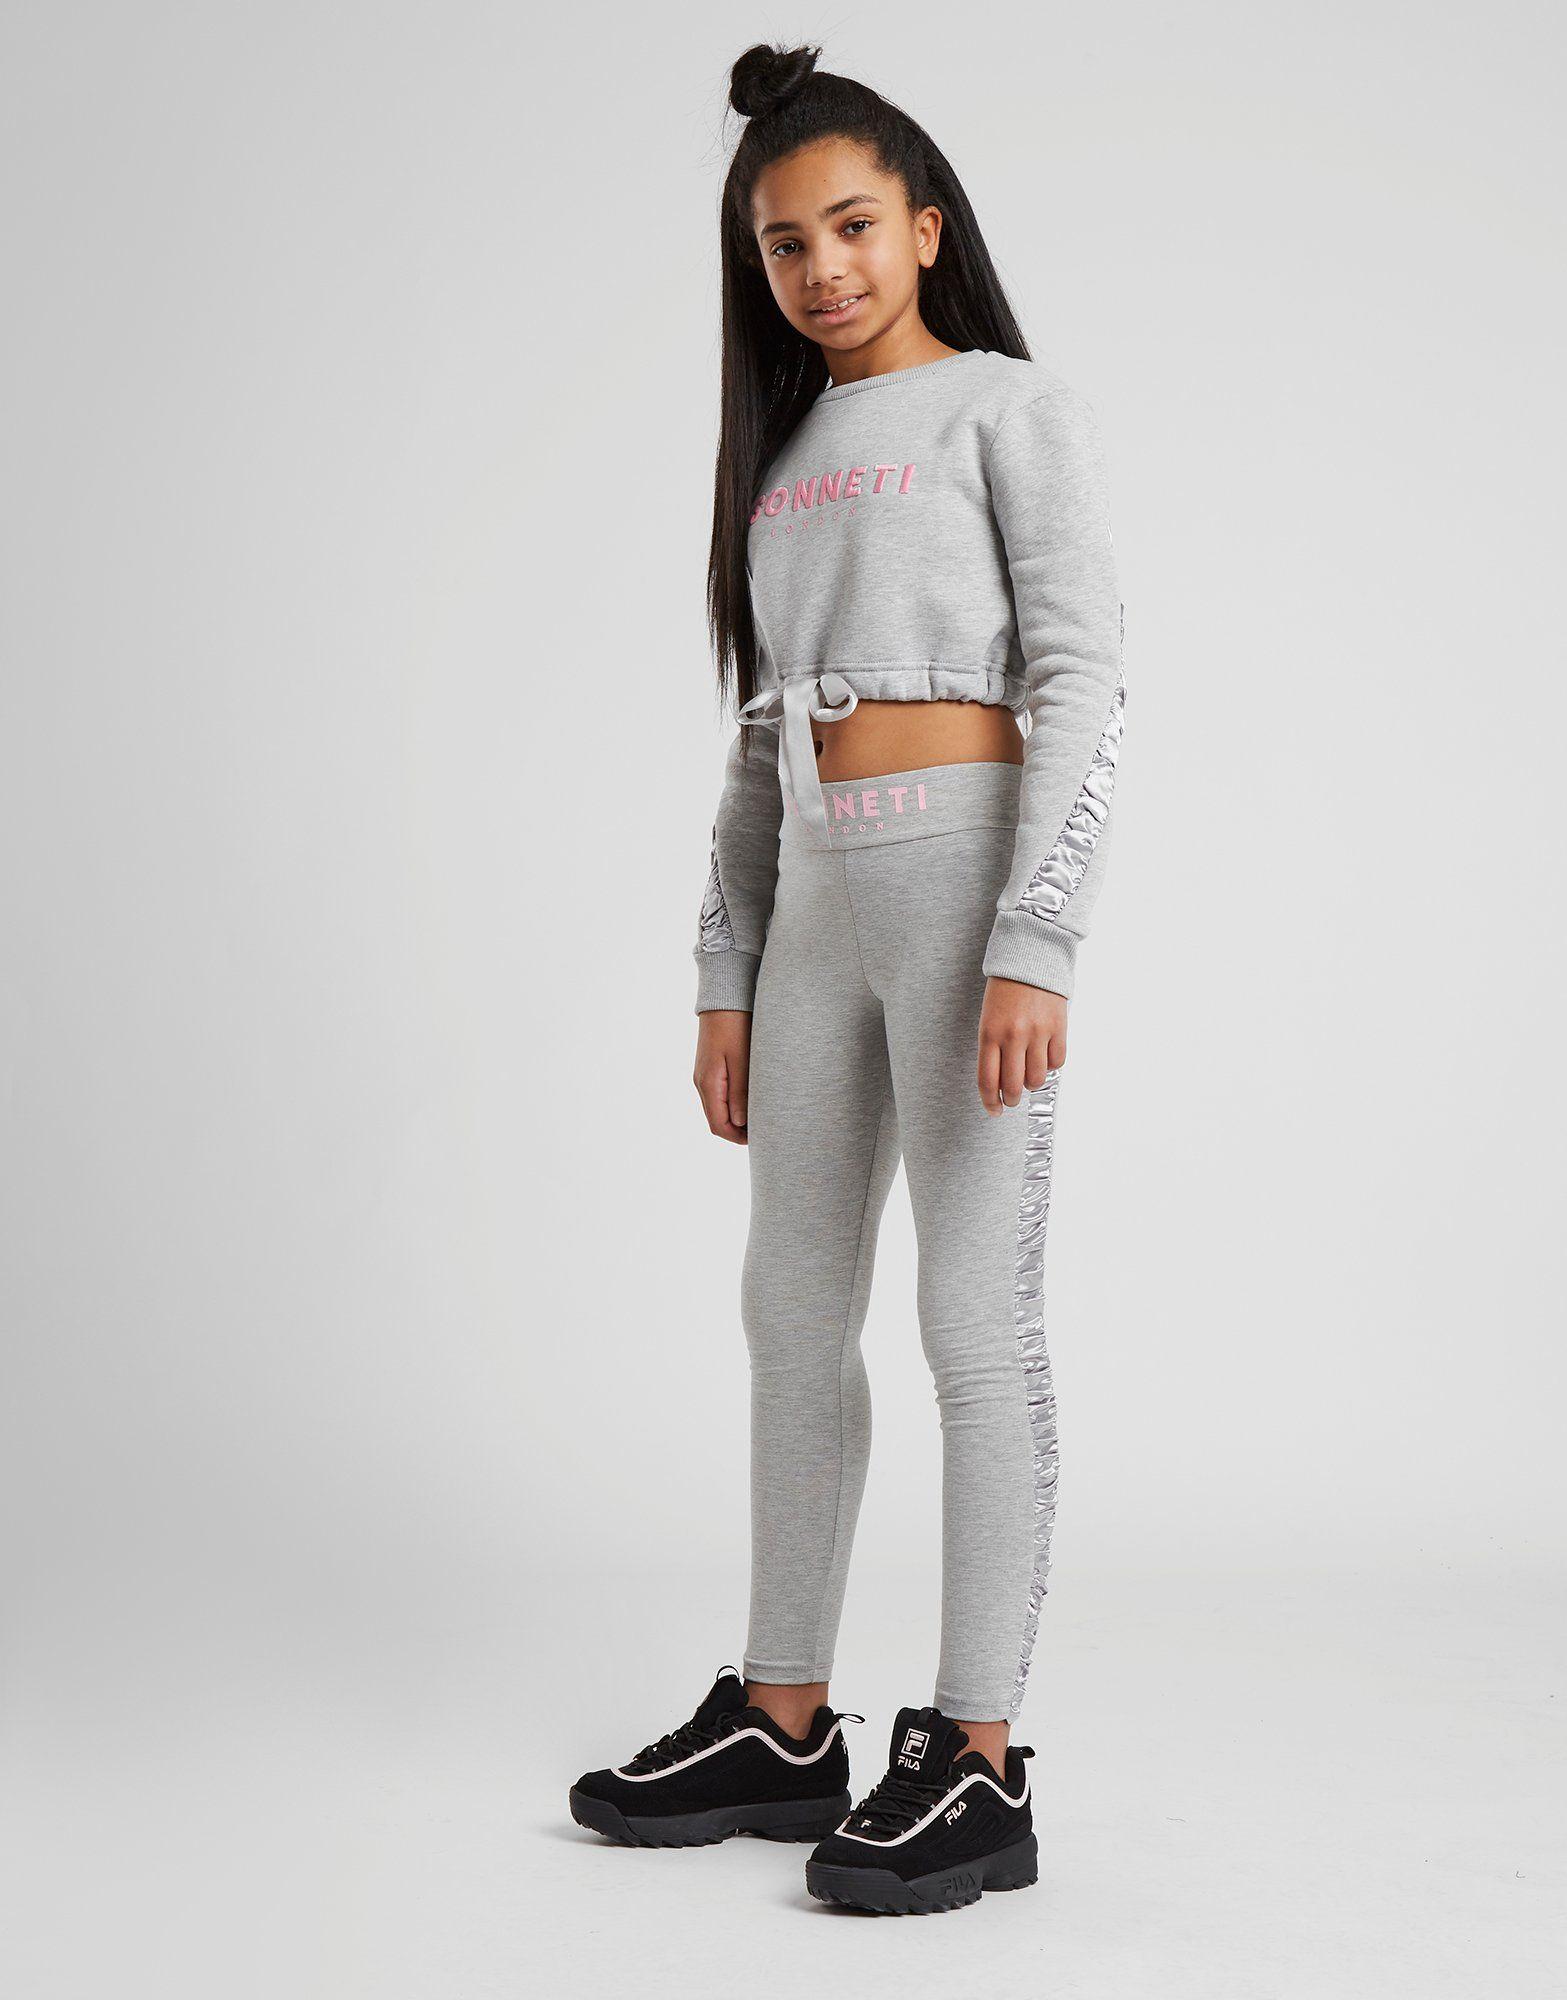 Sonneti Girls' Naomi Ruched Crew Sweatshirt Junior